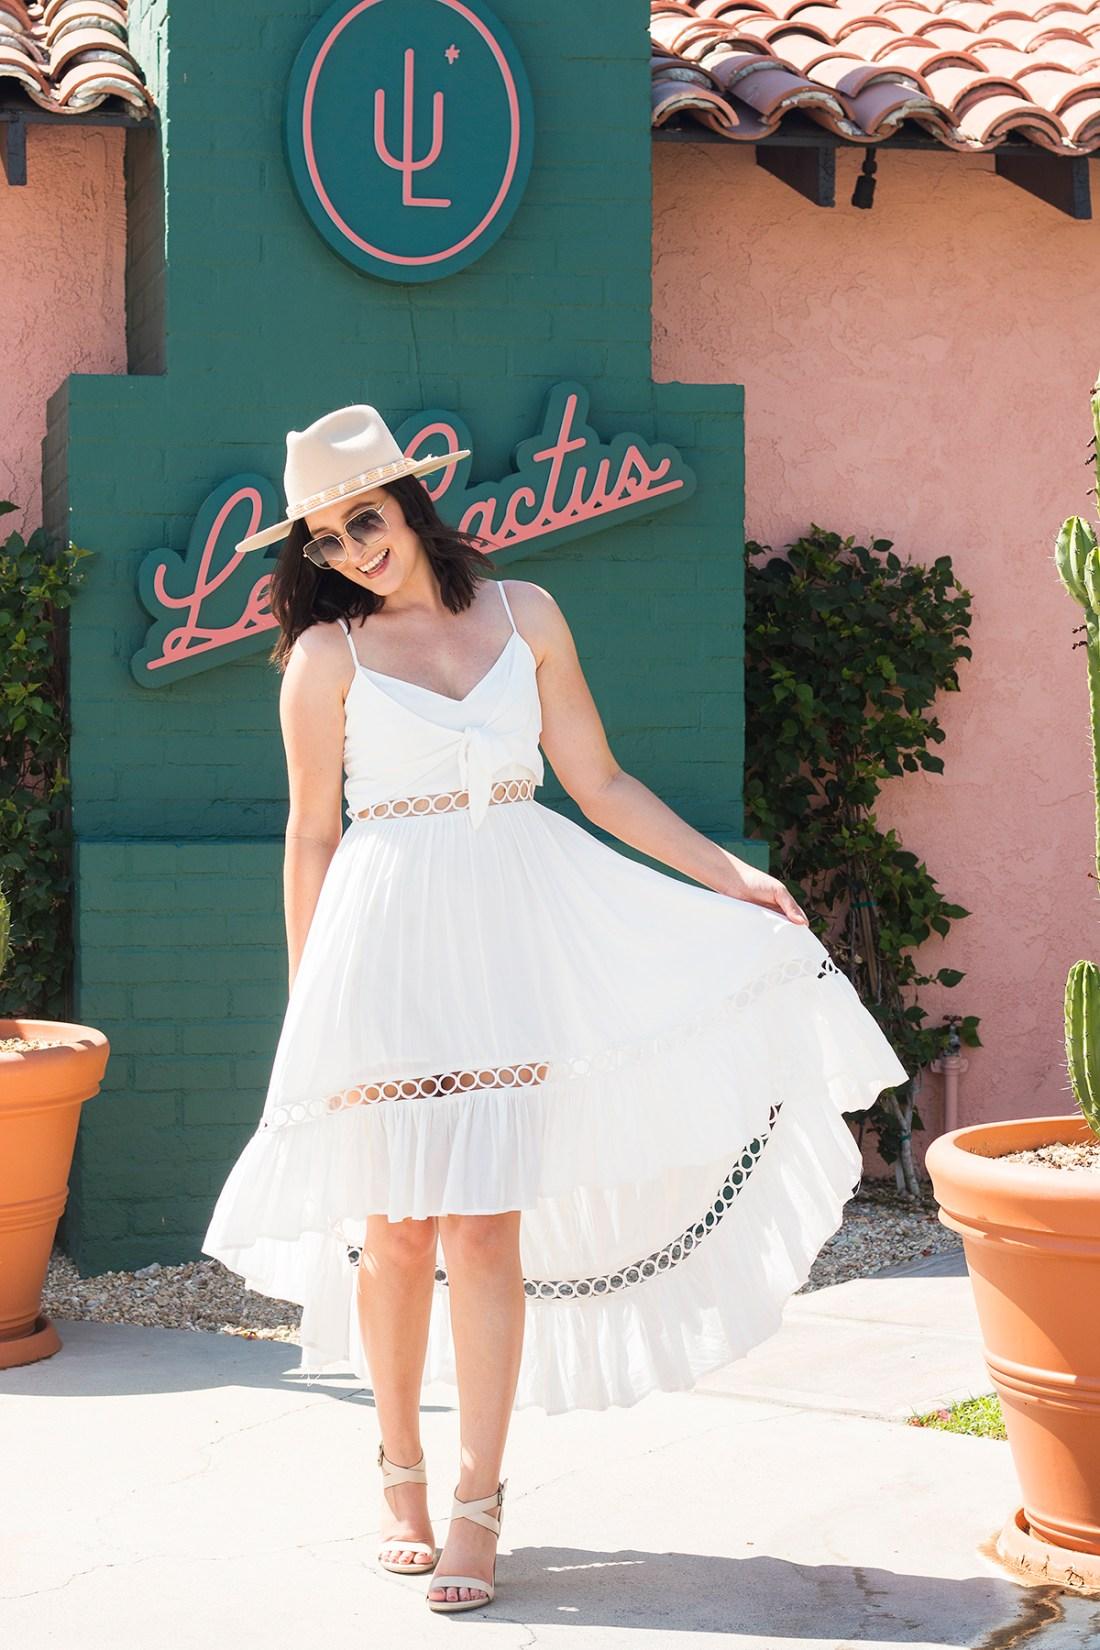 Les Cactus Boutique Hotel Palm Springs | A Good Hue